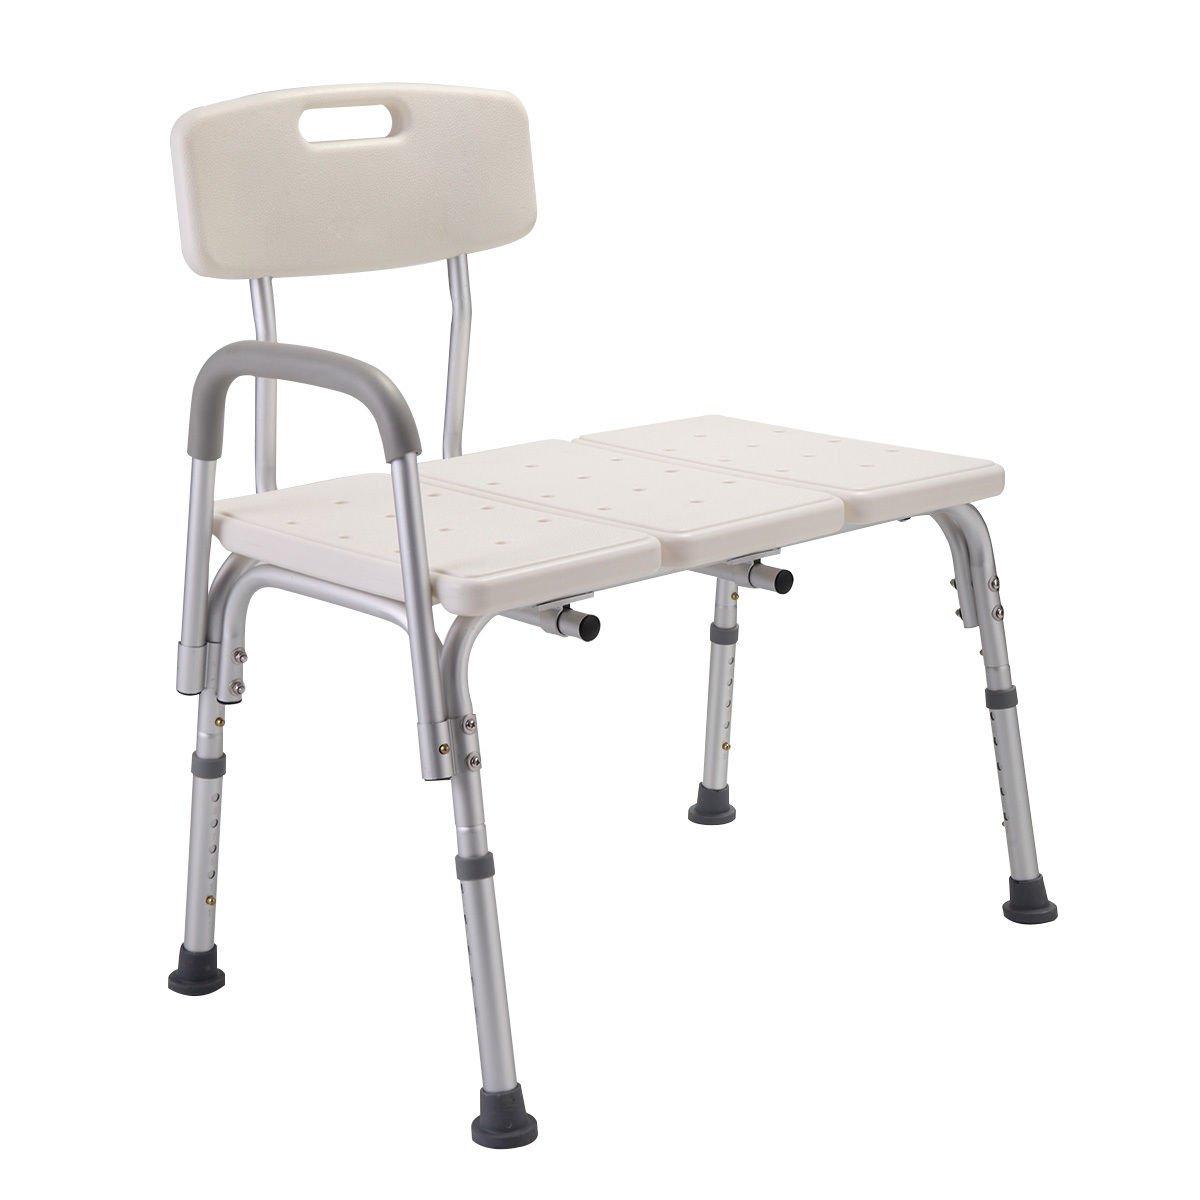 10 Position Height Adjustable Medical Shower Chair Bath Tub Bench Stool Seat Armrest Backrest Versatile Multifunctional Portable Design Elderly Handicapped Disabilities People Hospital Medical Chair